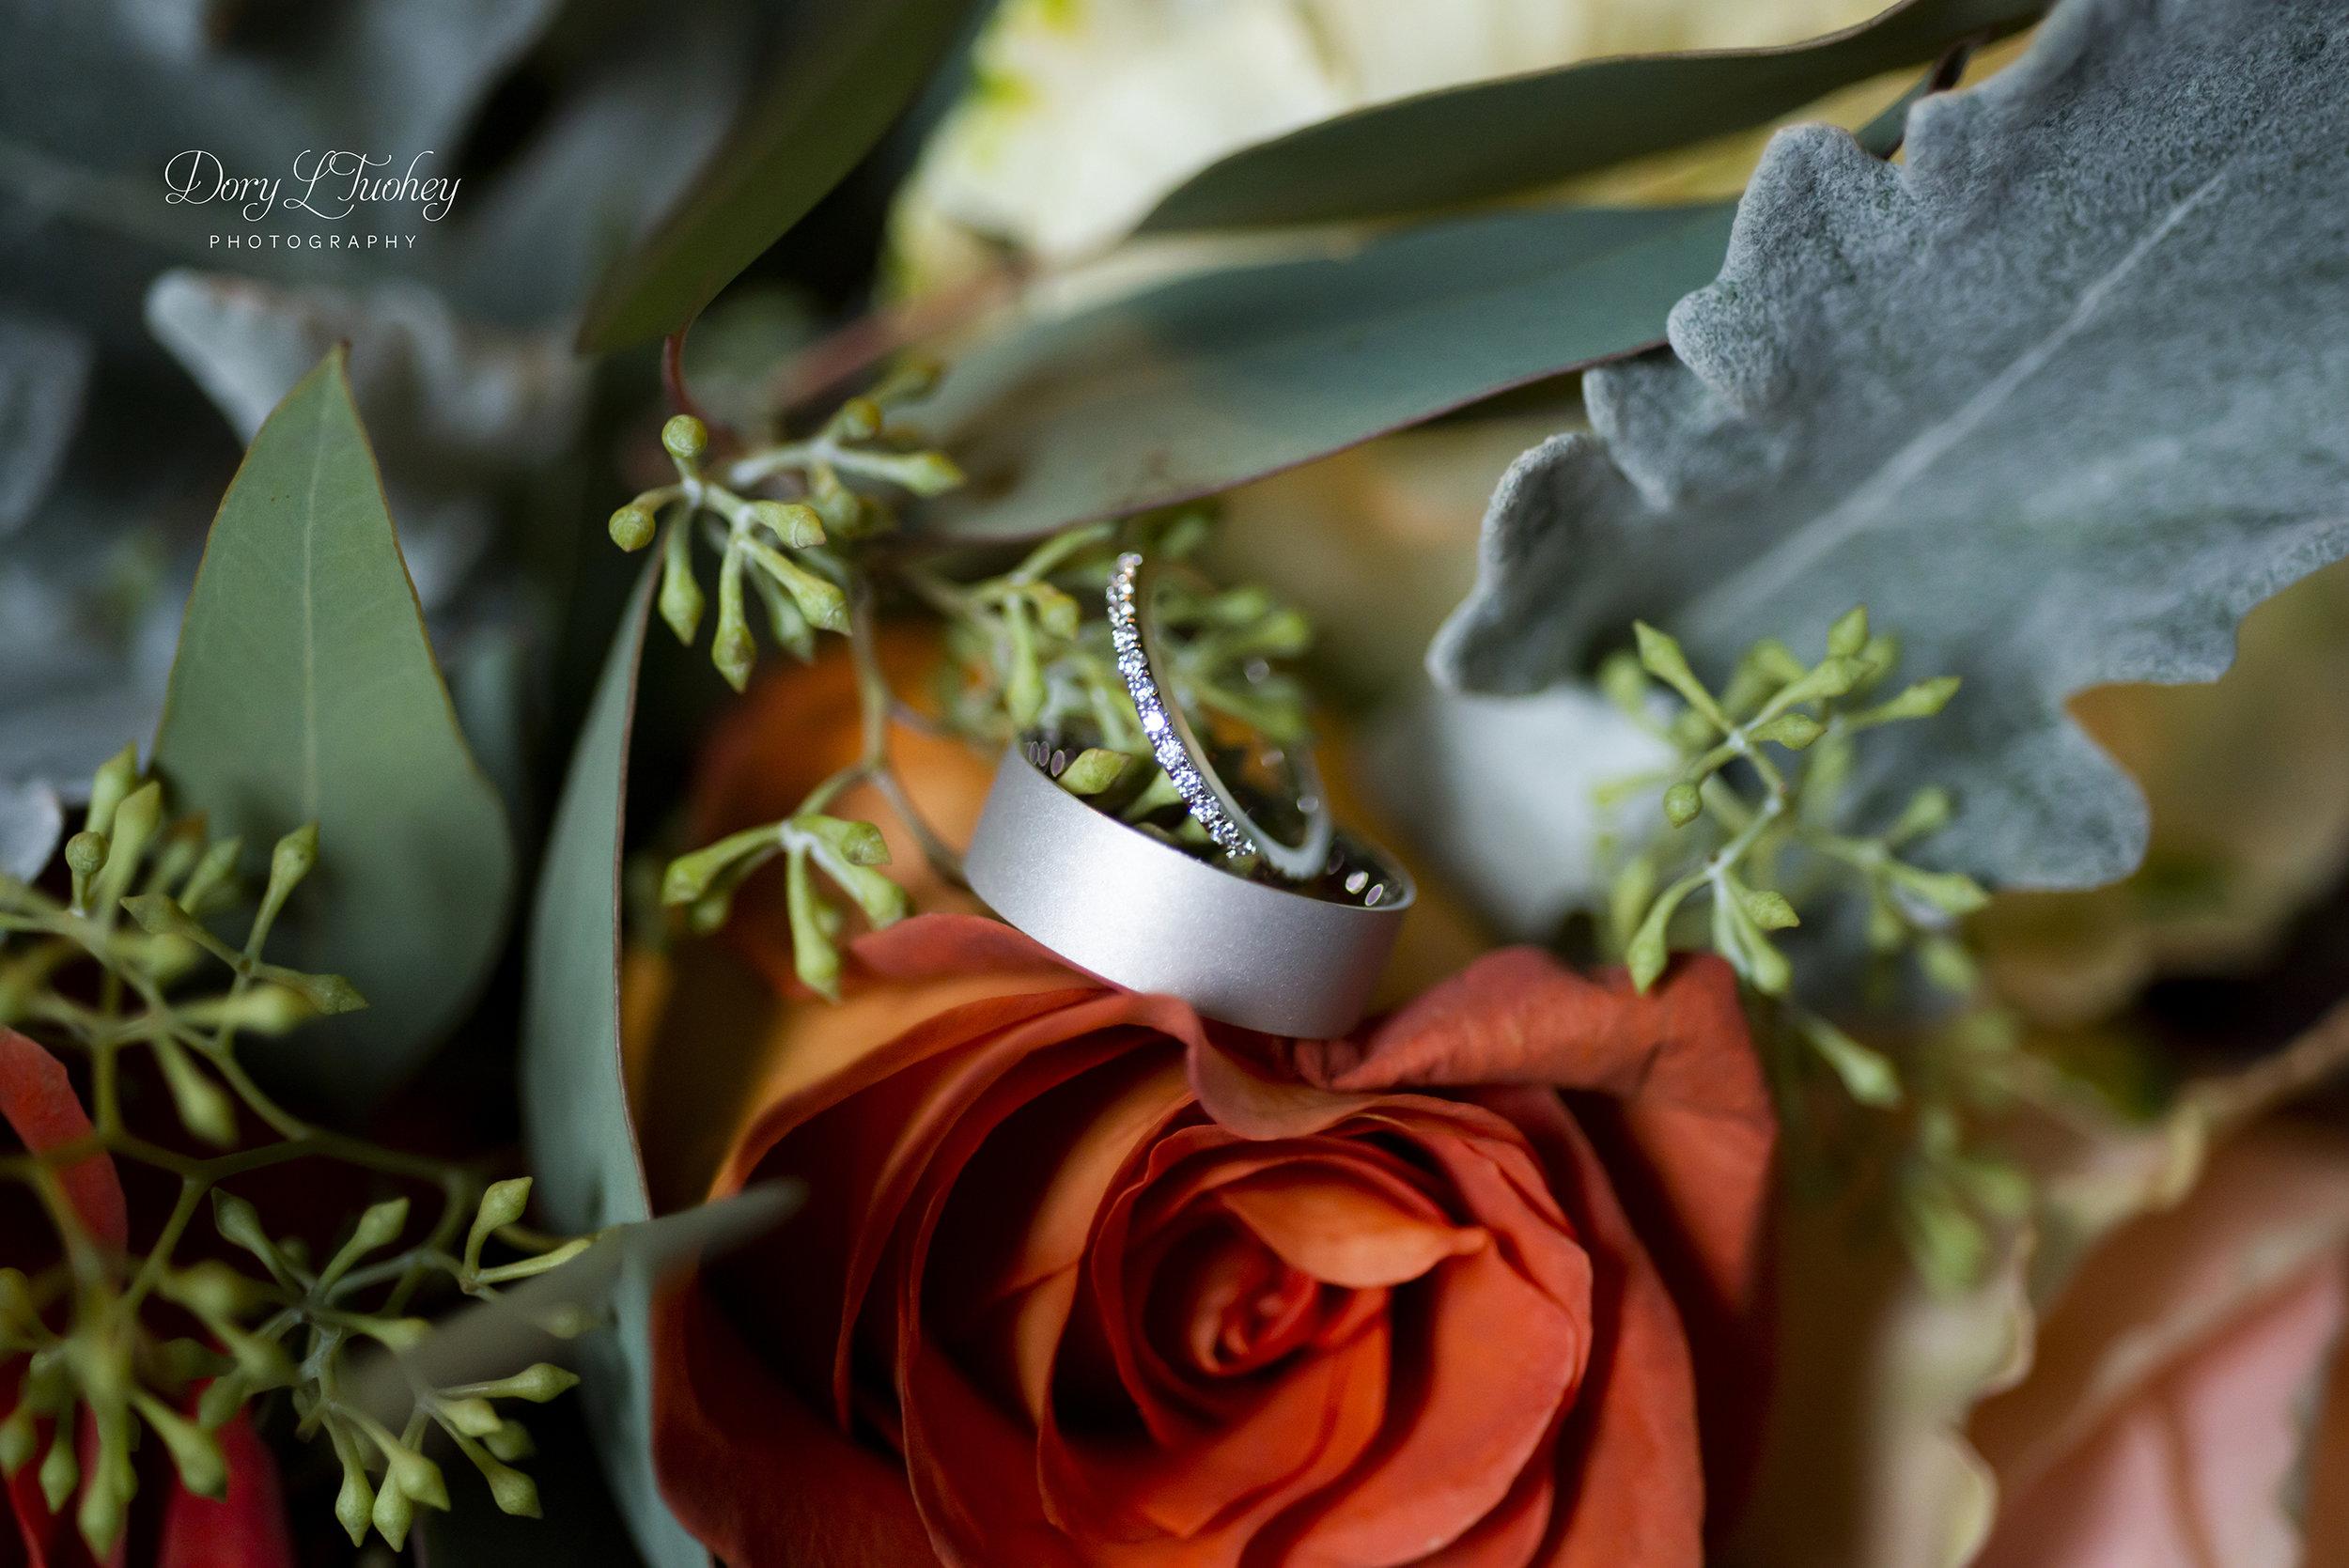 Rookery_chicago_dory_photographer_wedding_stairs_bhldn_love_dawson_13.jpg